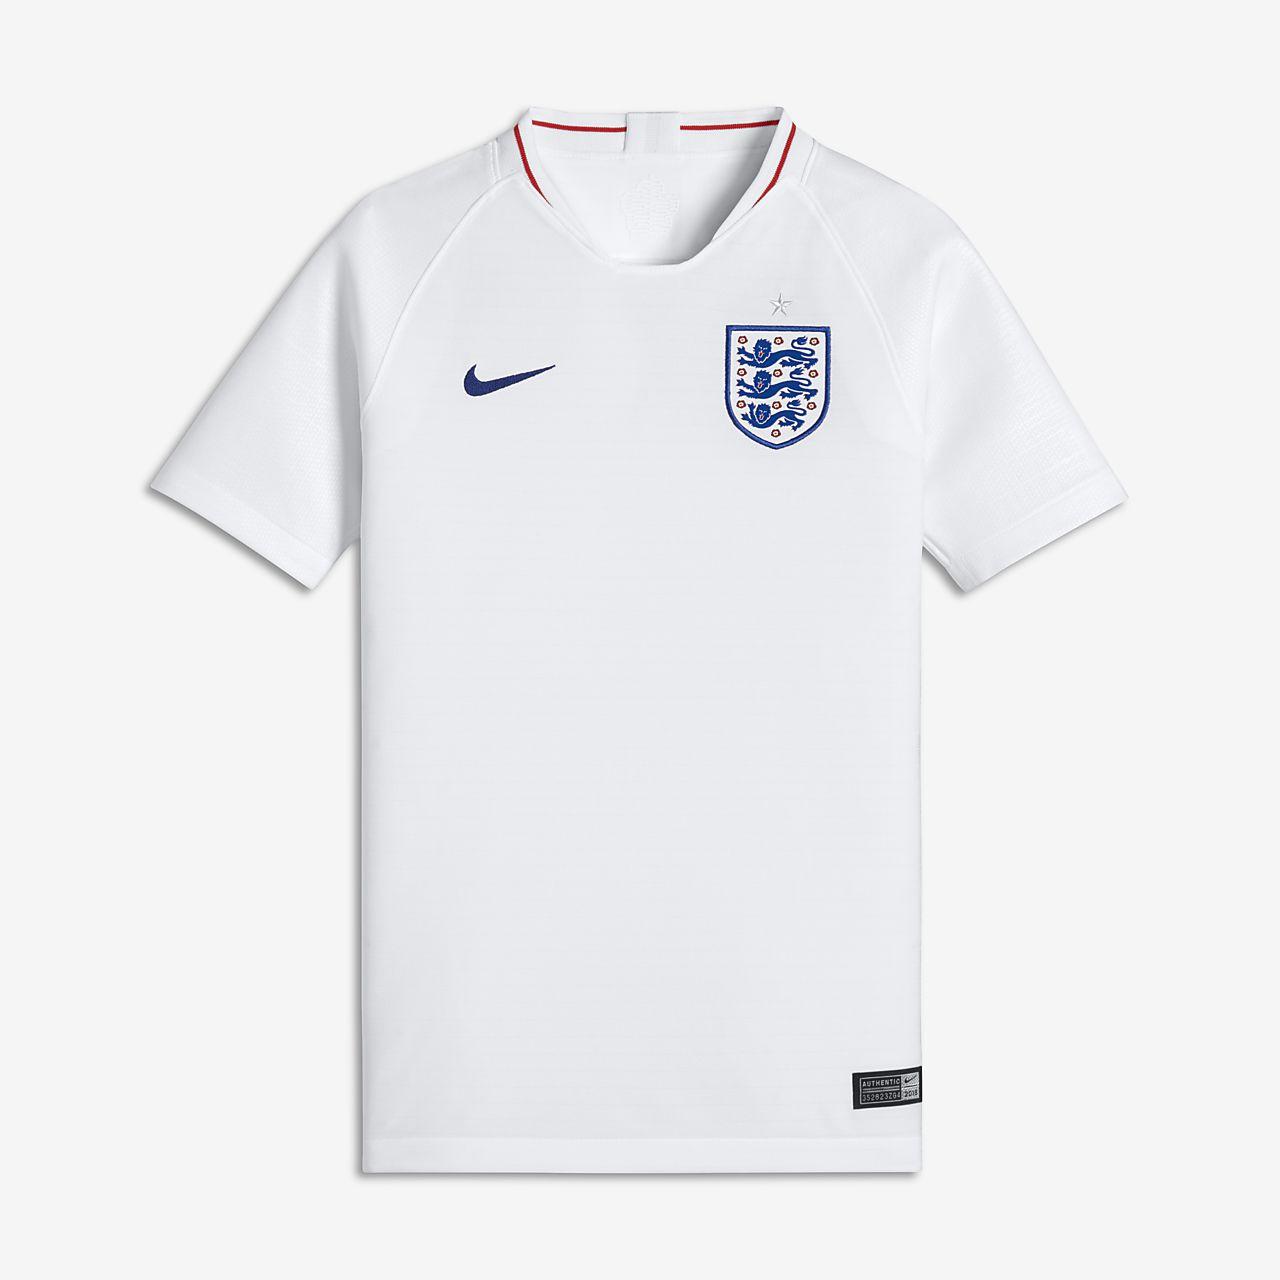 2018 England Stadium Home Older Kids  Football Shirt. Nike.com AU 99c683b40